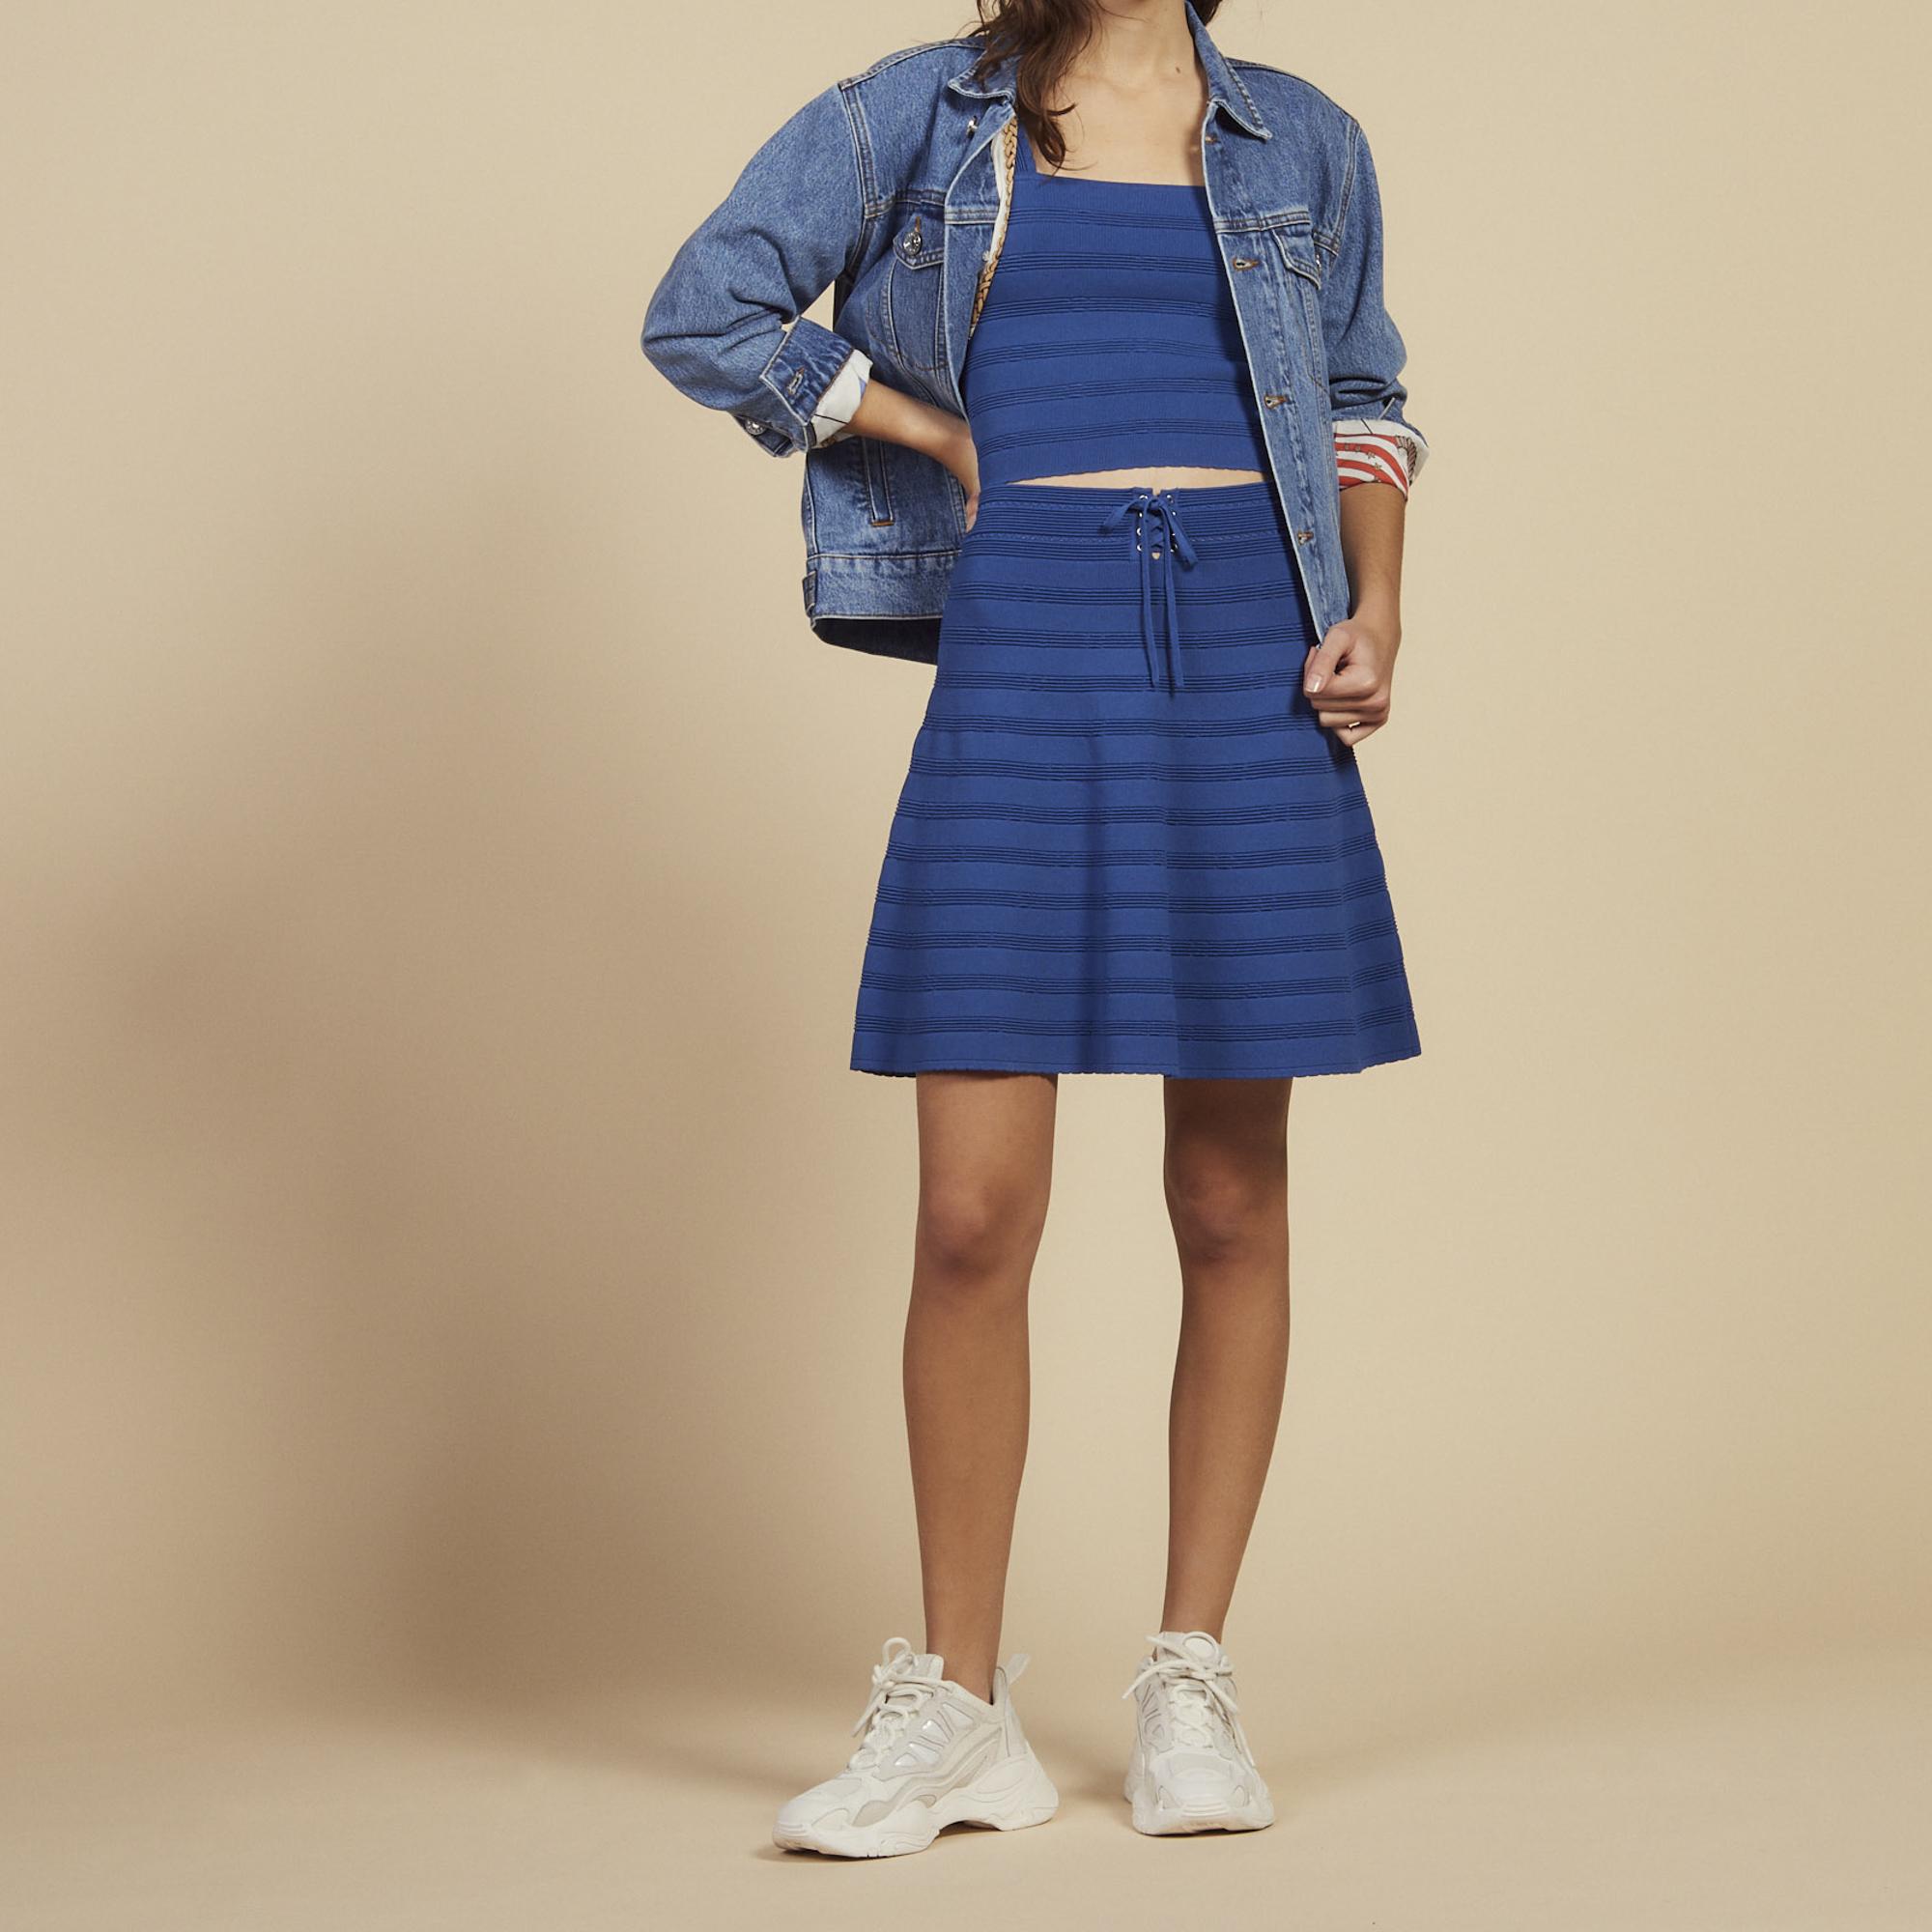 Falda corta evasé de punto   Faldas   Shorts color Bleu jean ... 549e25fa4d96